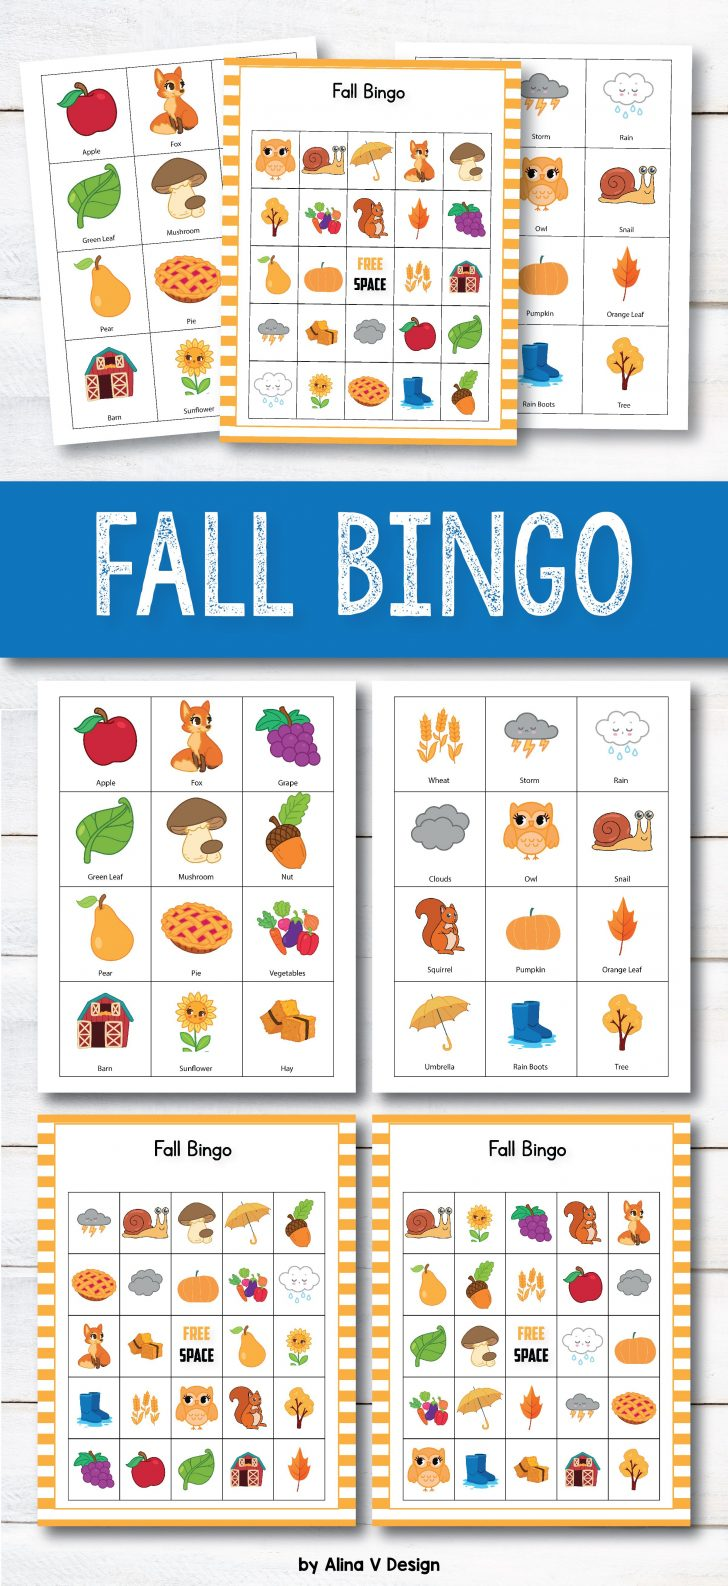 Free Printable Fall Bingo Cards